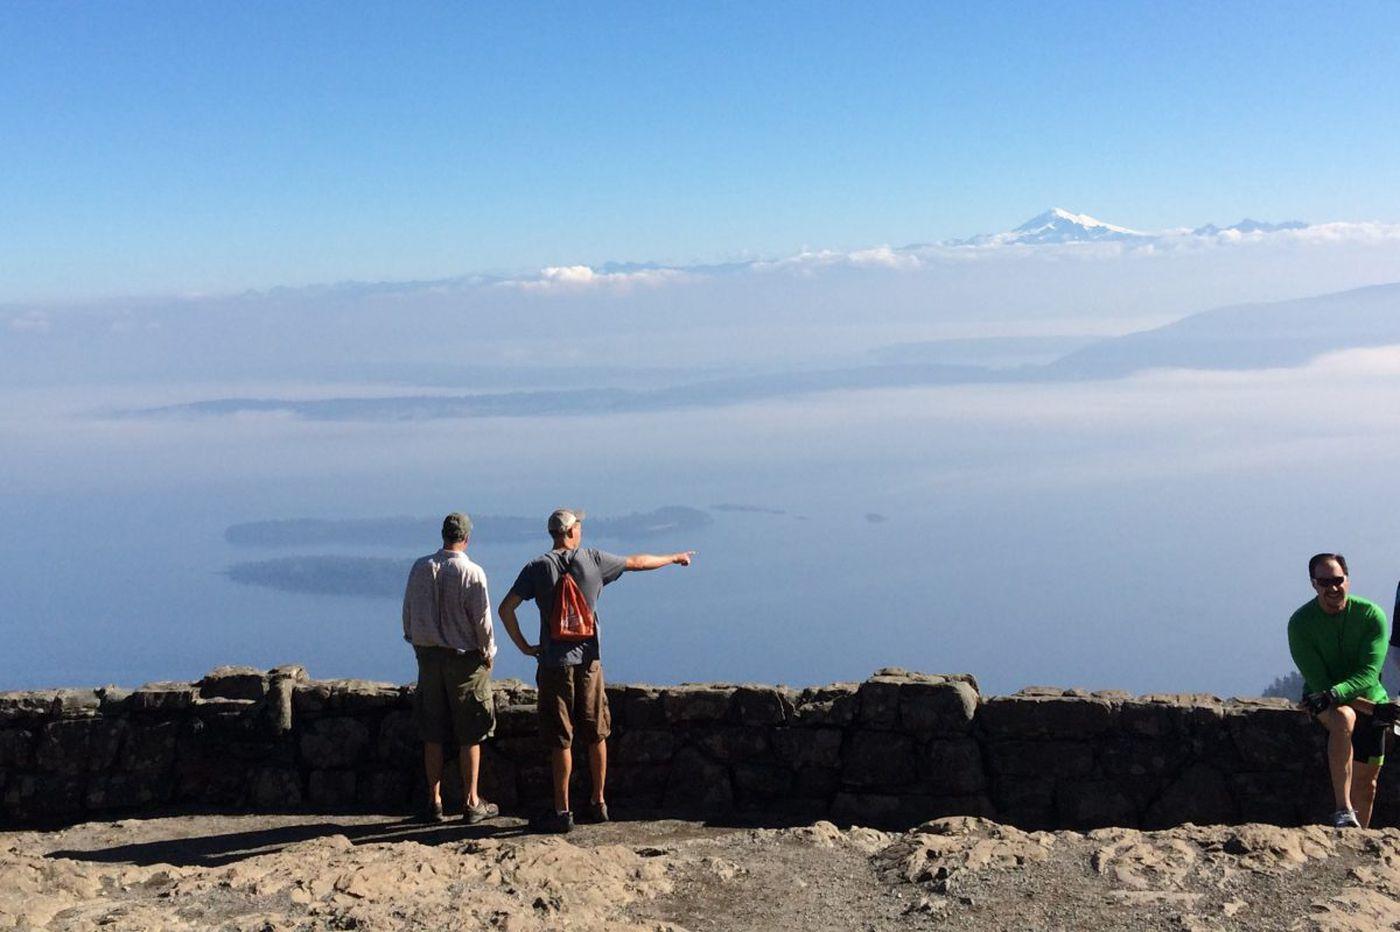 In Washington's San Juan Islands, an expedition cruise and wondrous hiking